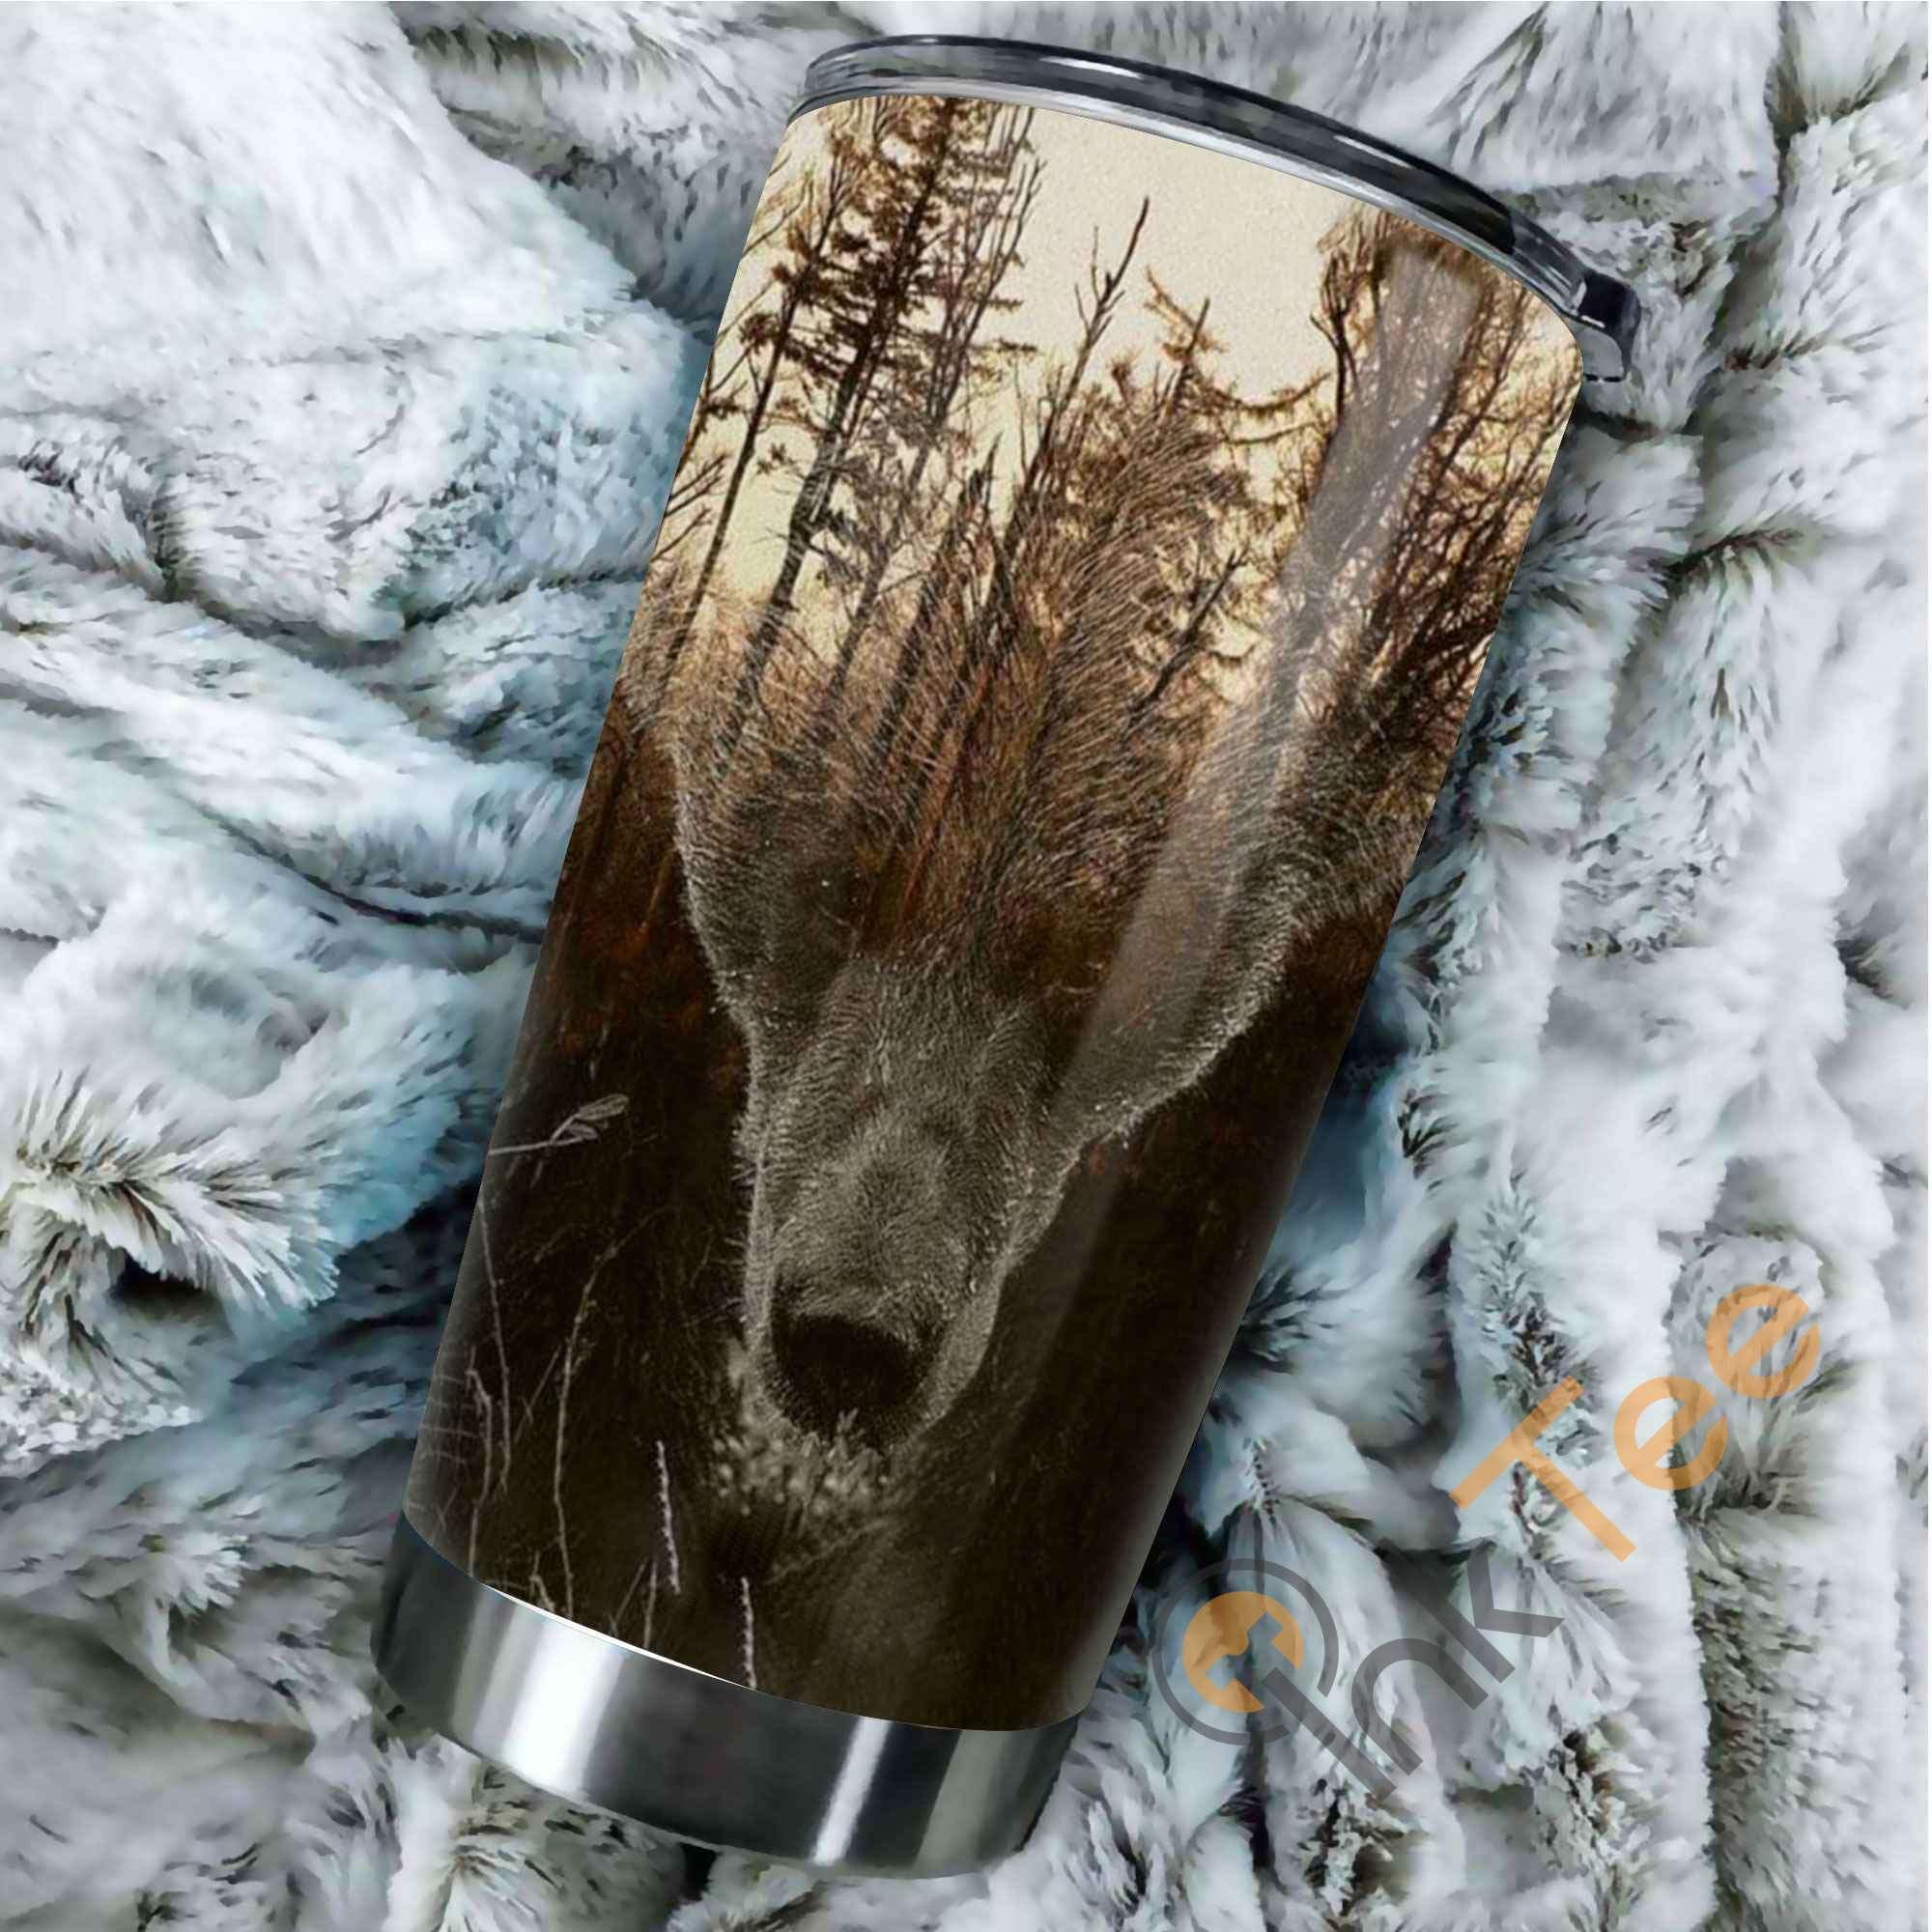 Beautiful Bear Amazon Best Seller Sku 3631 Stainless Steel Tumbler